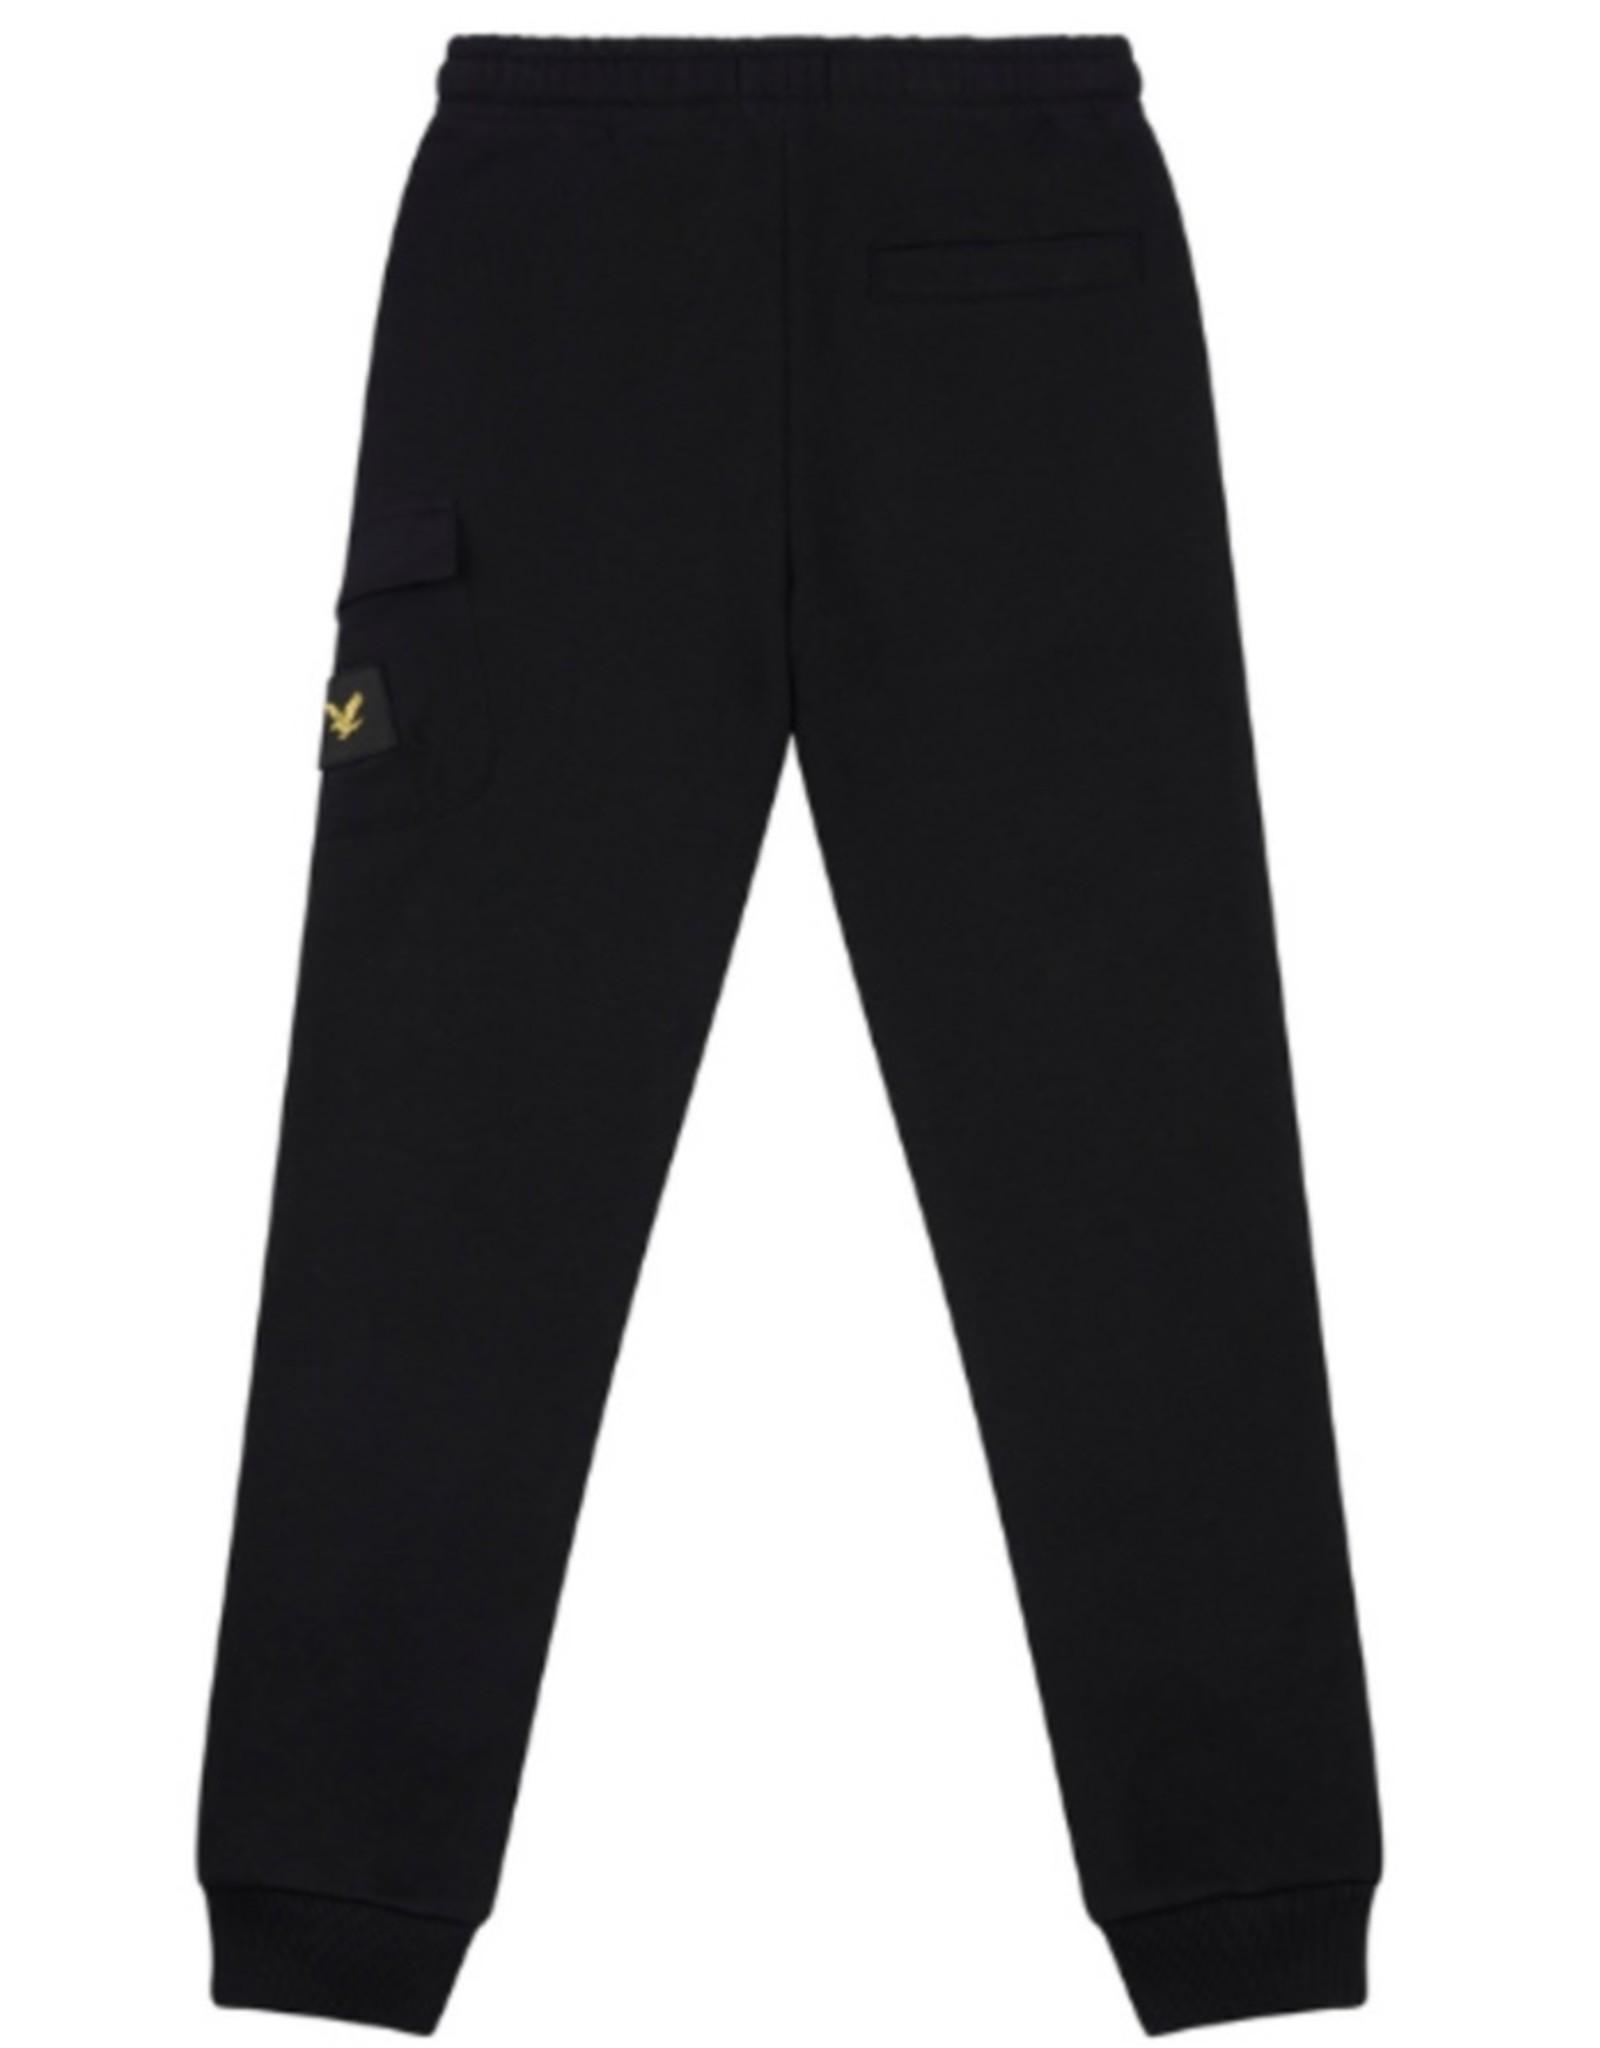 Lyle & Scott LSC1062 Sweatpants